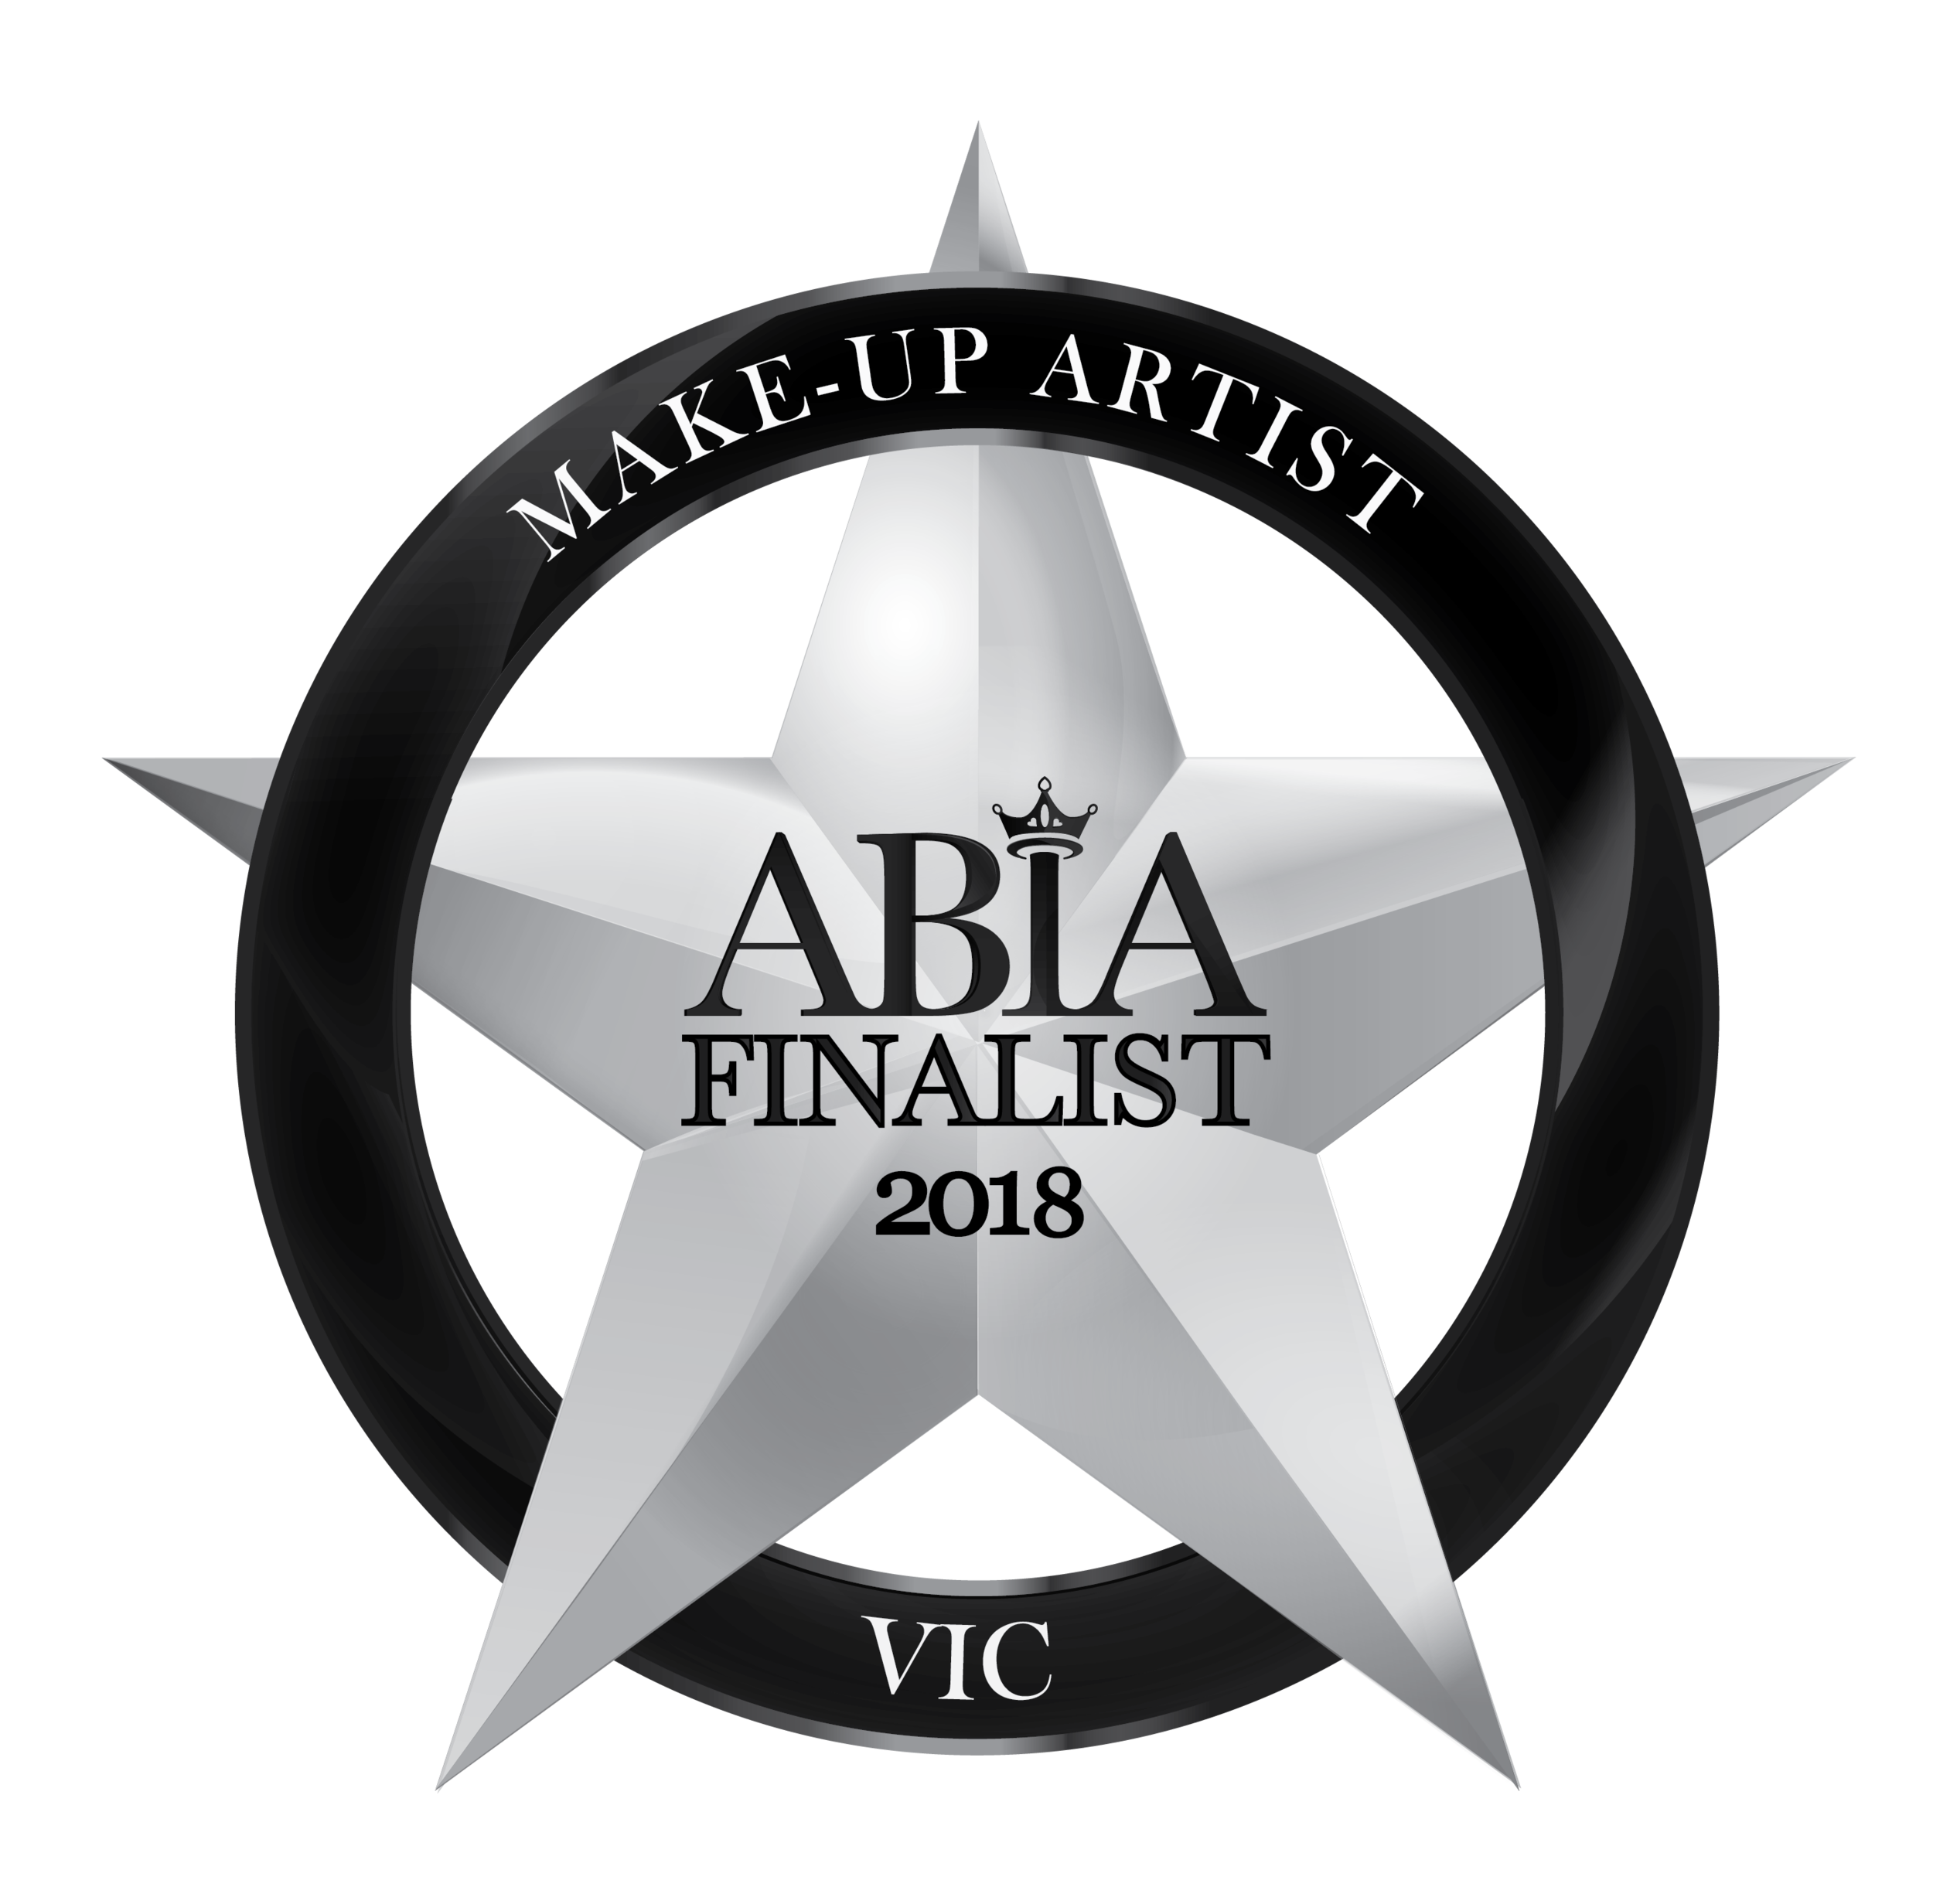 2018-VIC-ABIA-Award-Logo-MakeupArtist_FINALIST.png